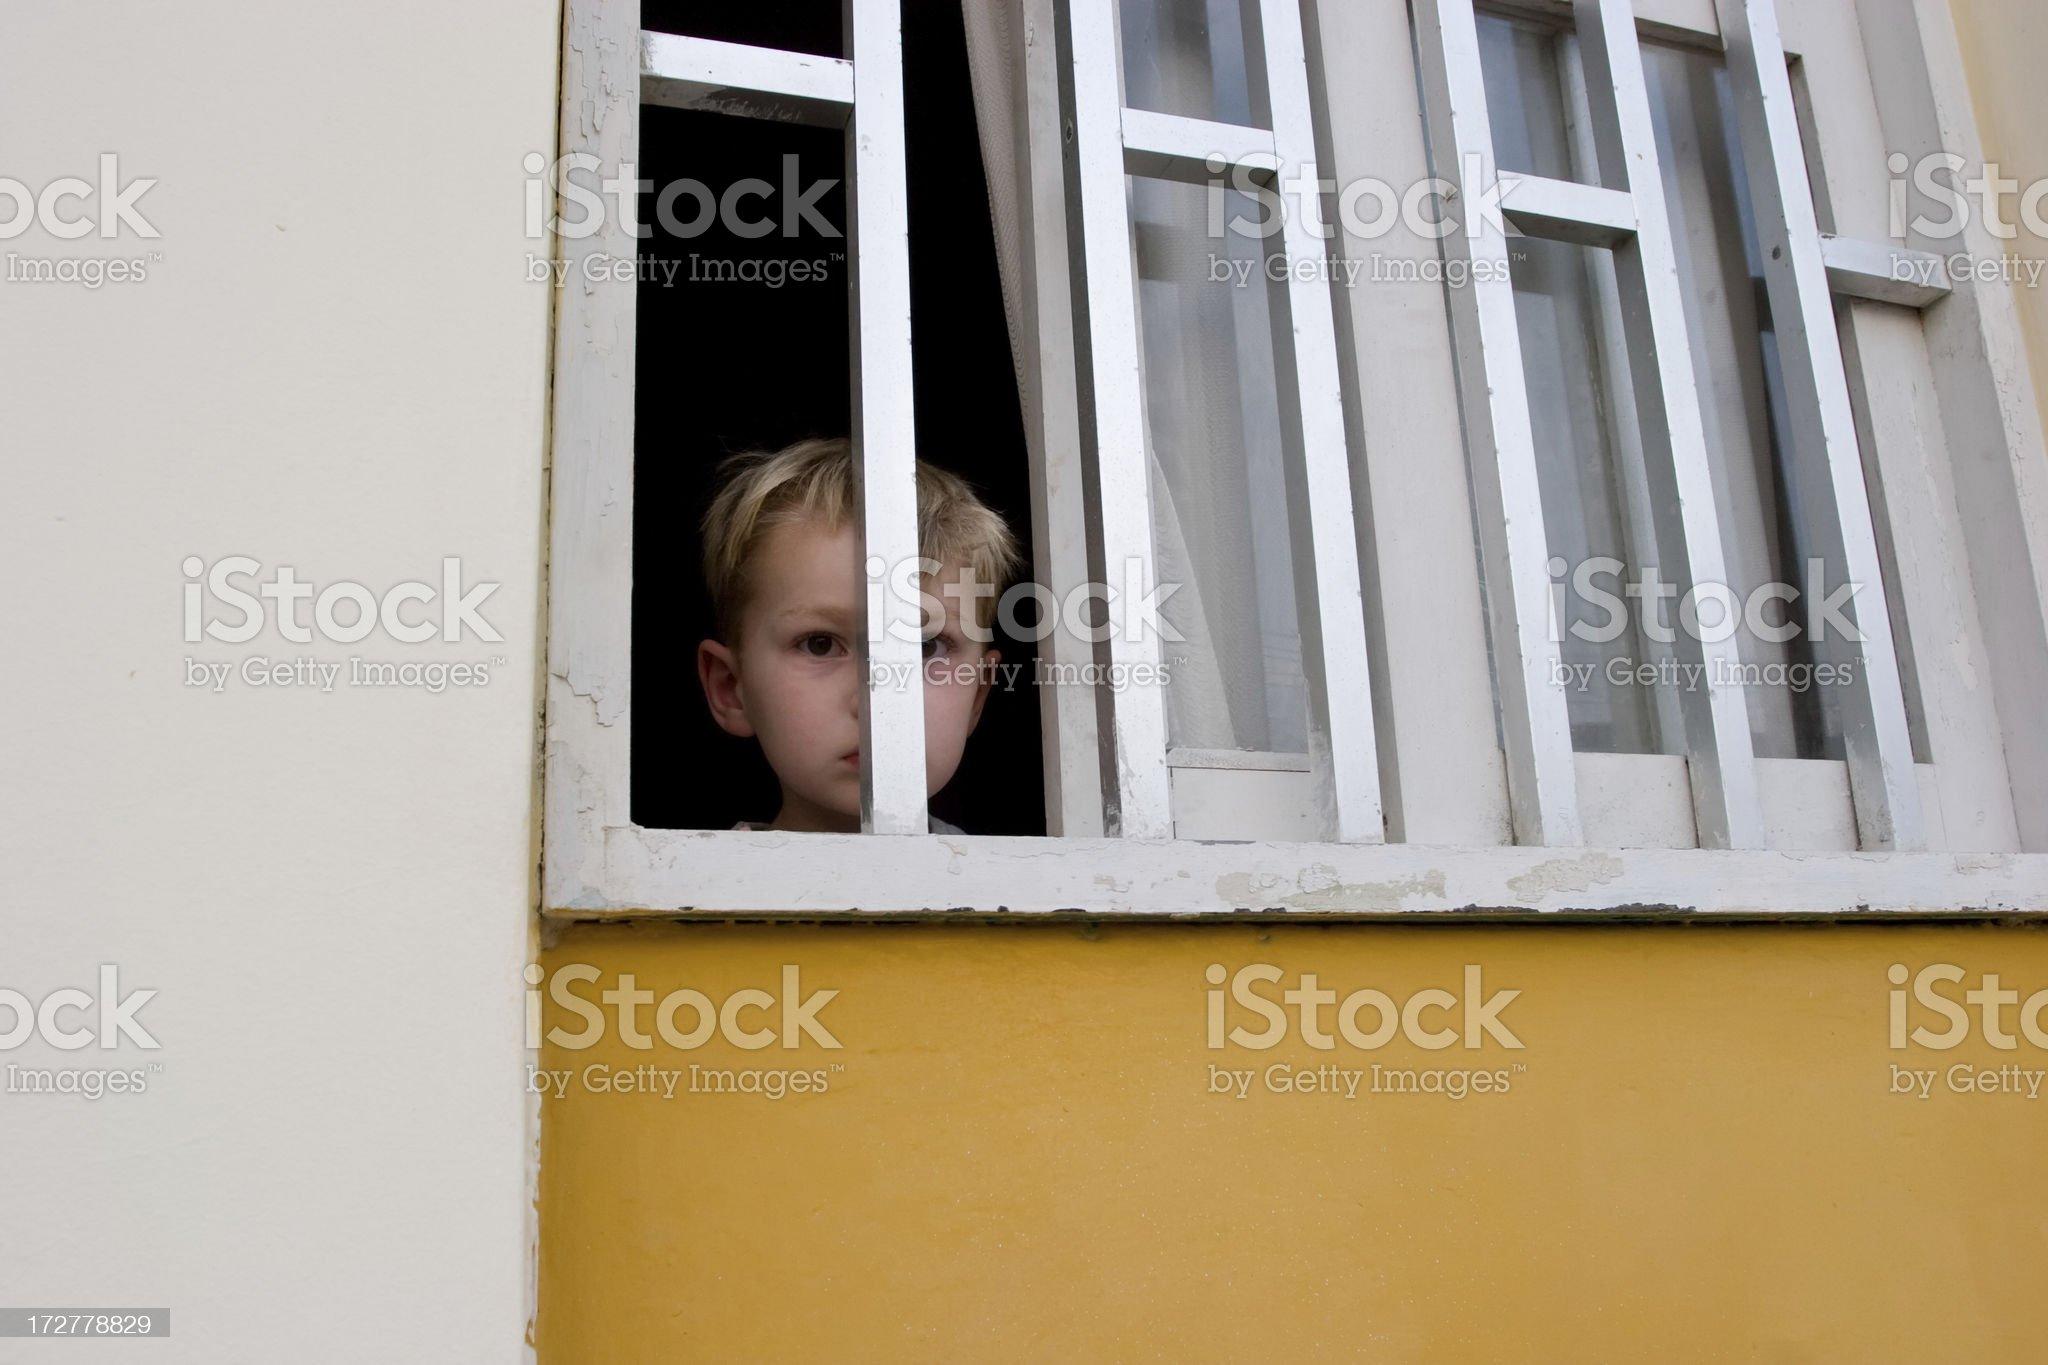 Child behind bars royalty-free stock photo